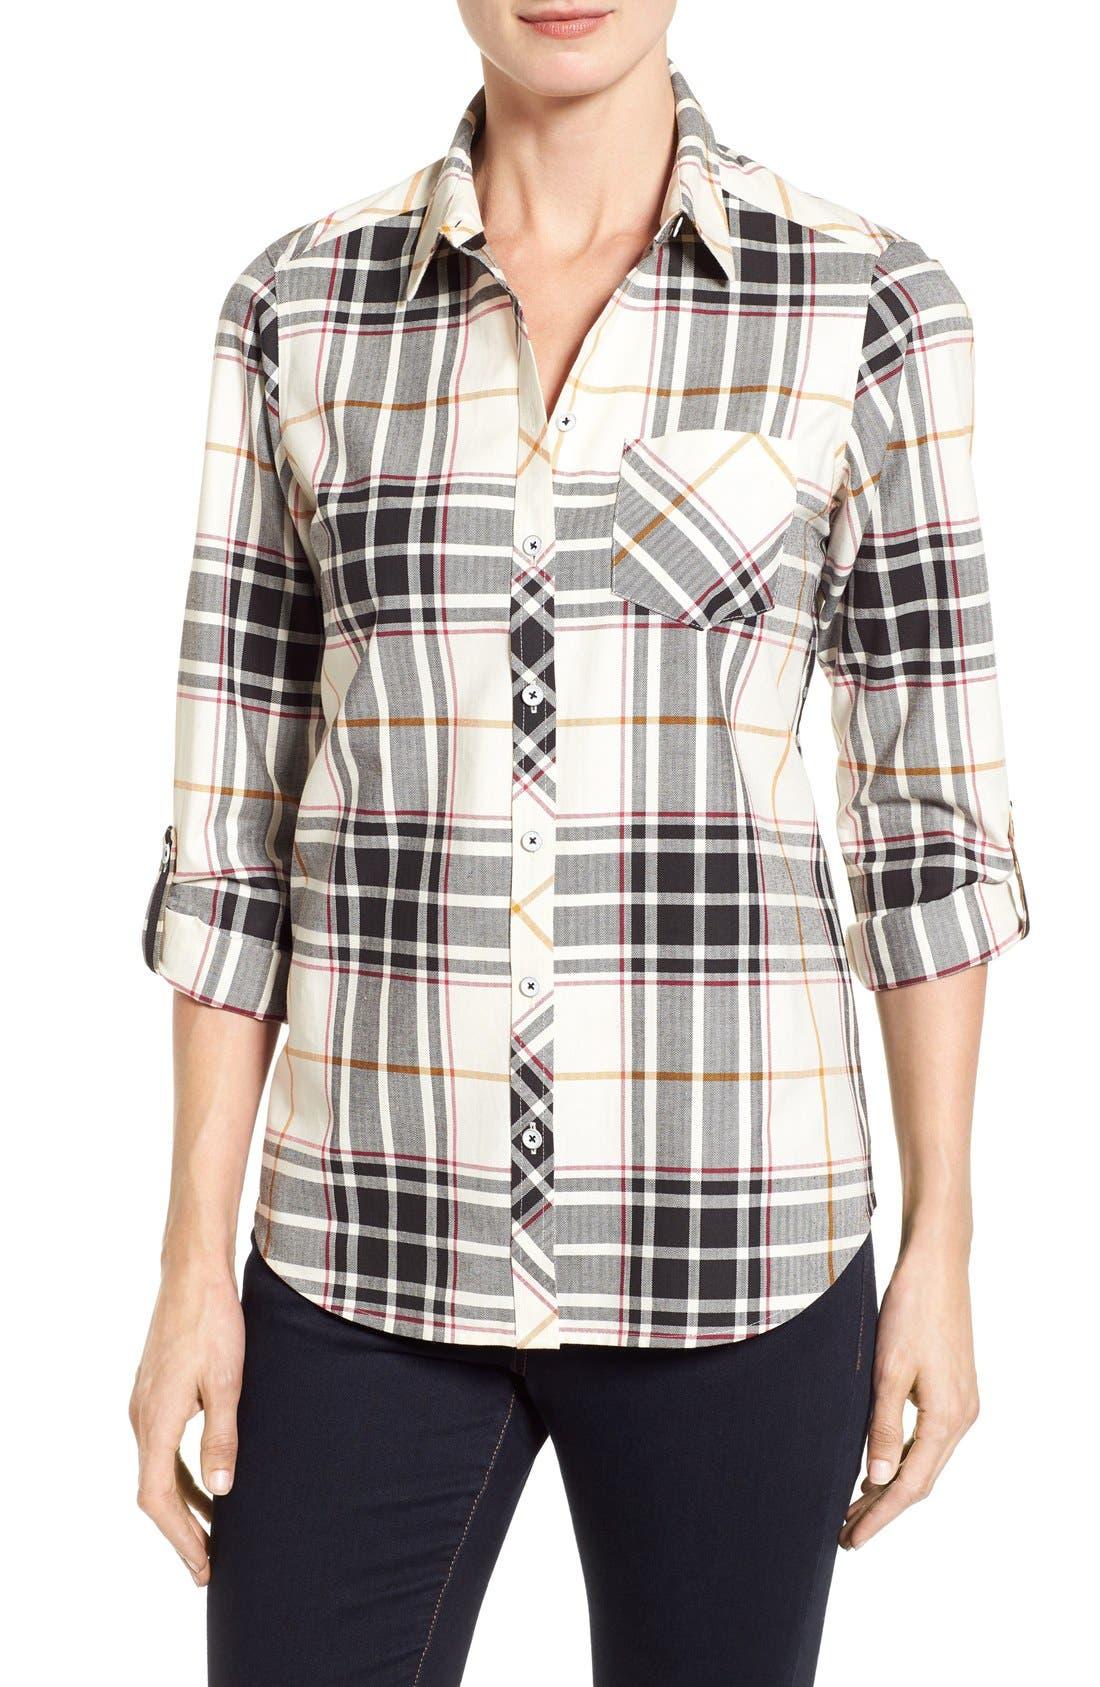 Main Image - Foxcroft Herringbone Plaid Roll Sleeve Shirt (Regular & Petite)